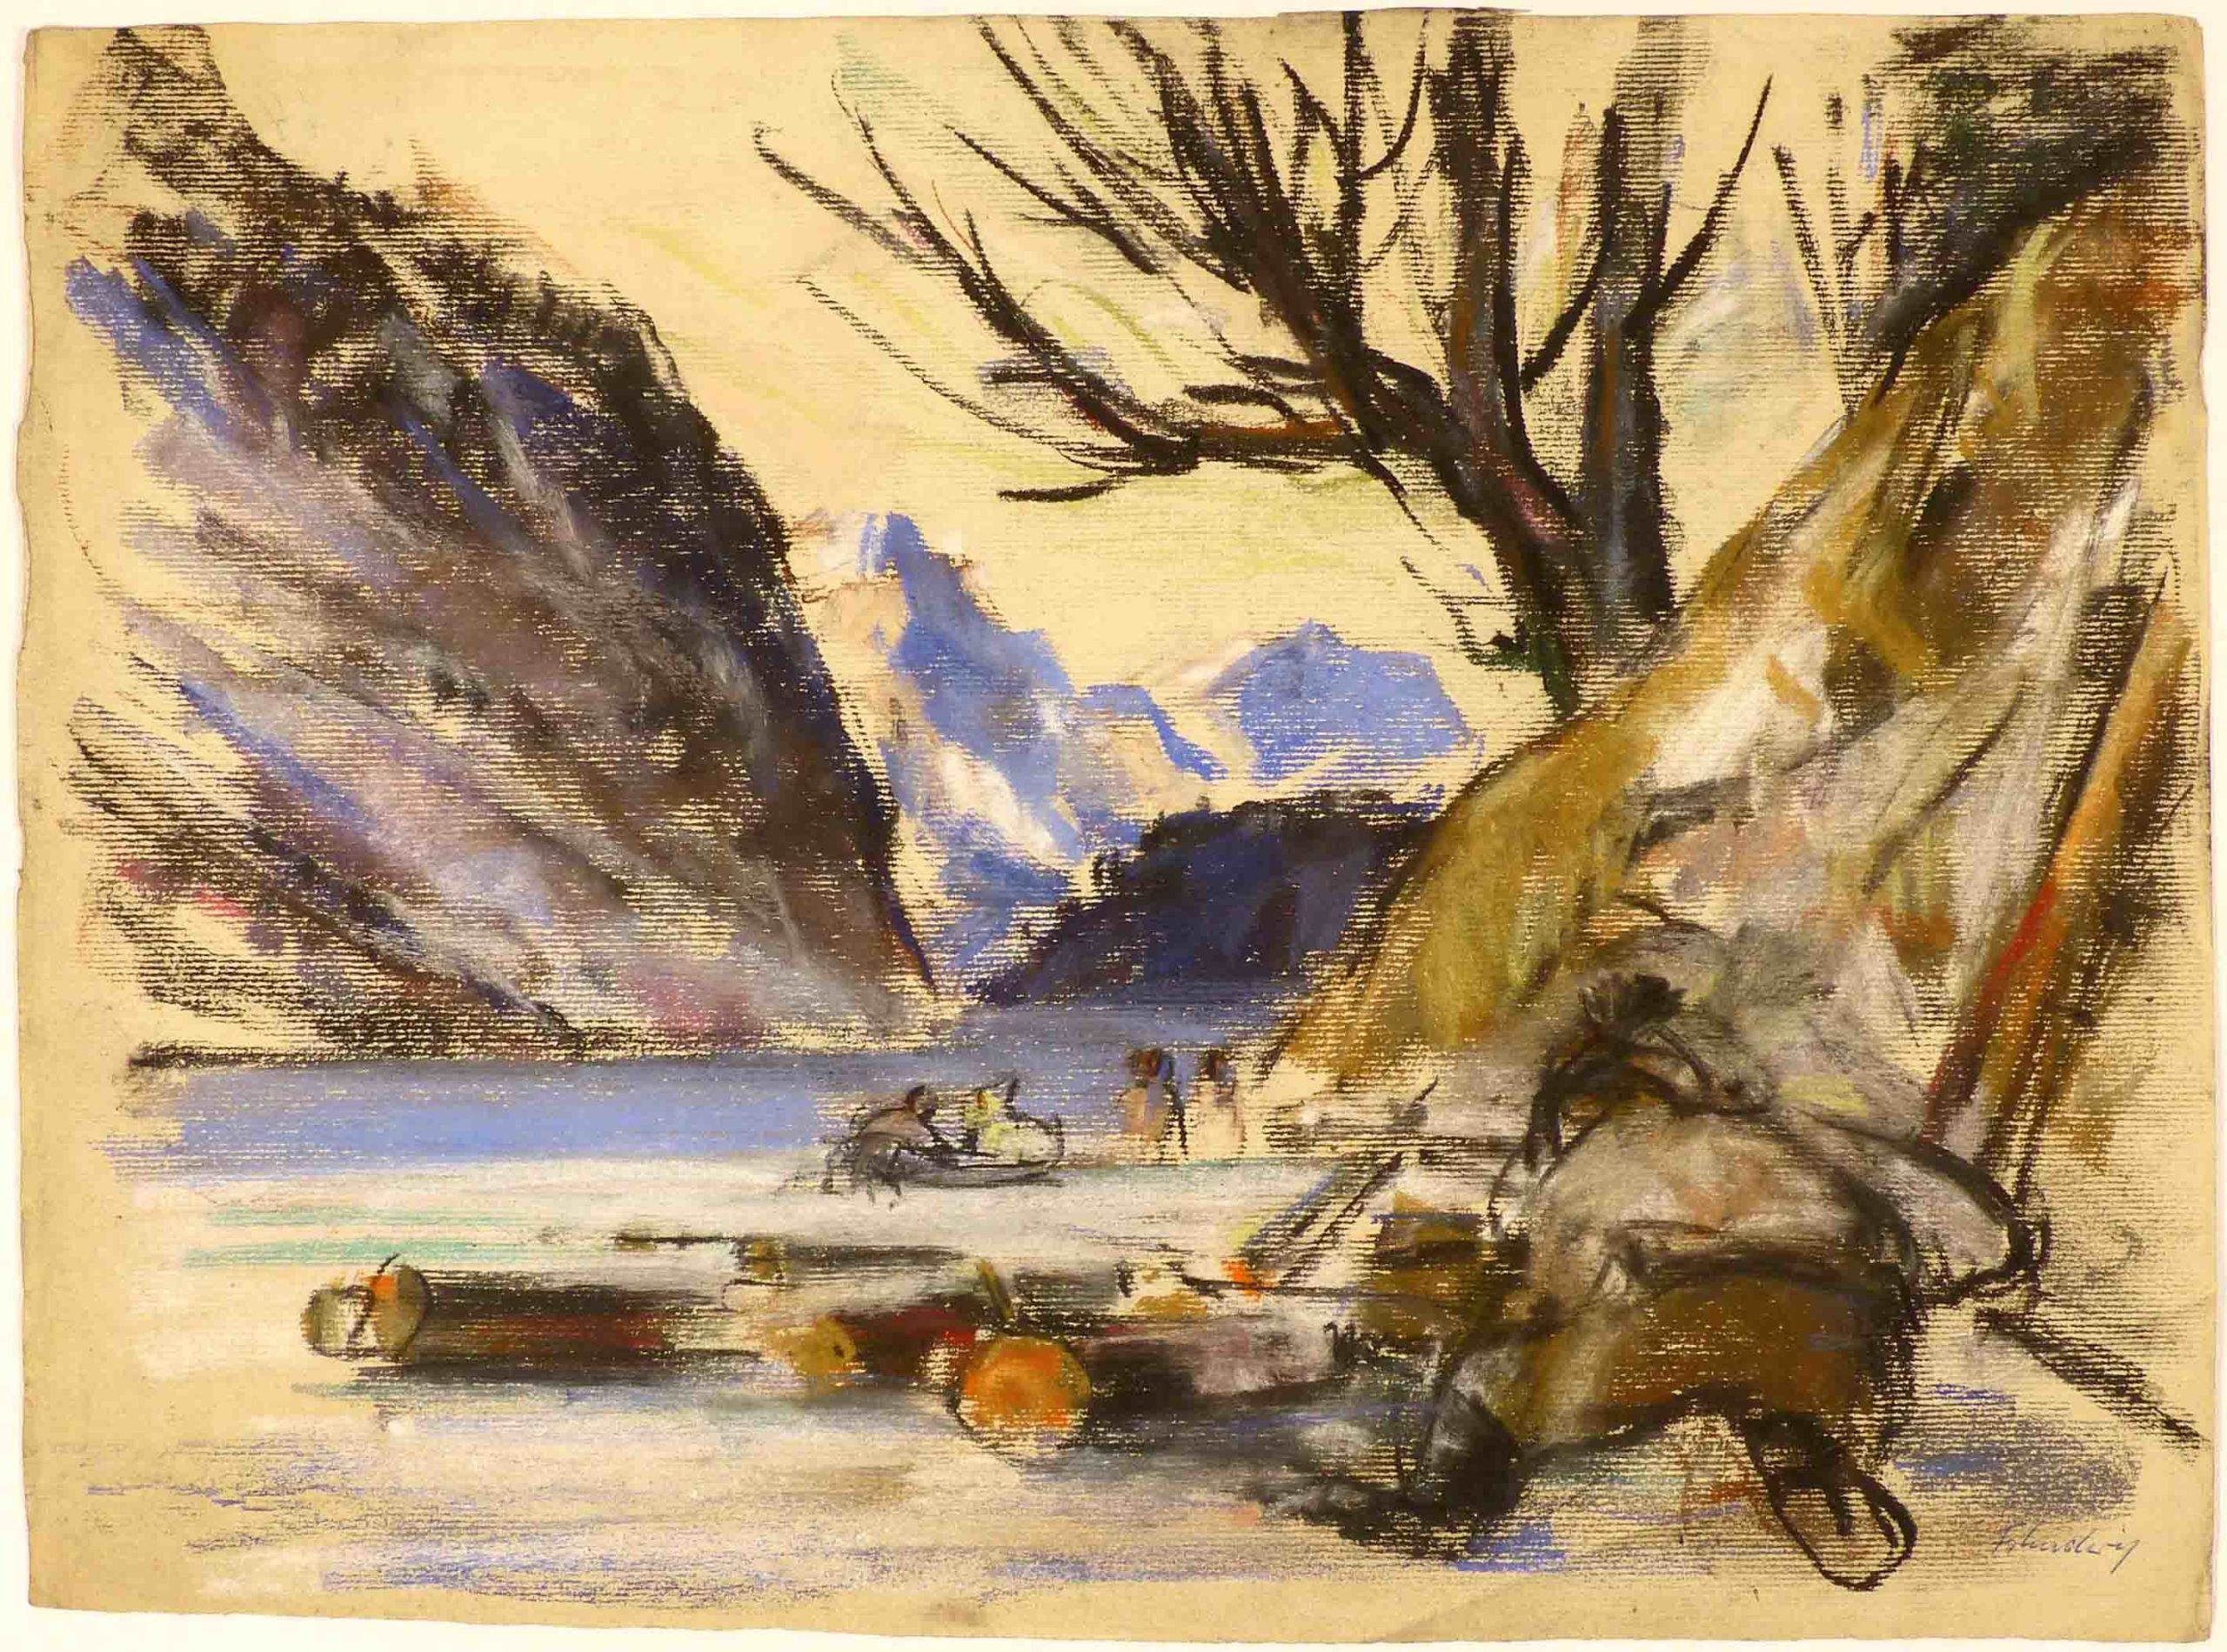 Winter am Koenigssee